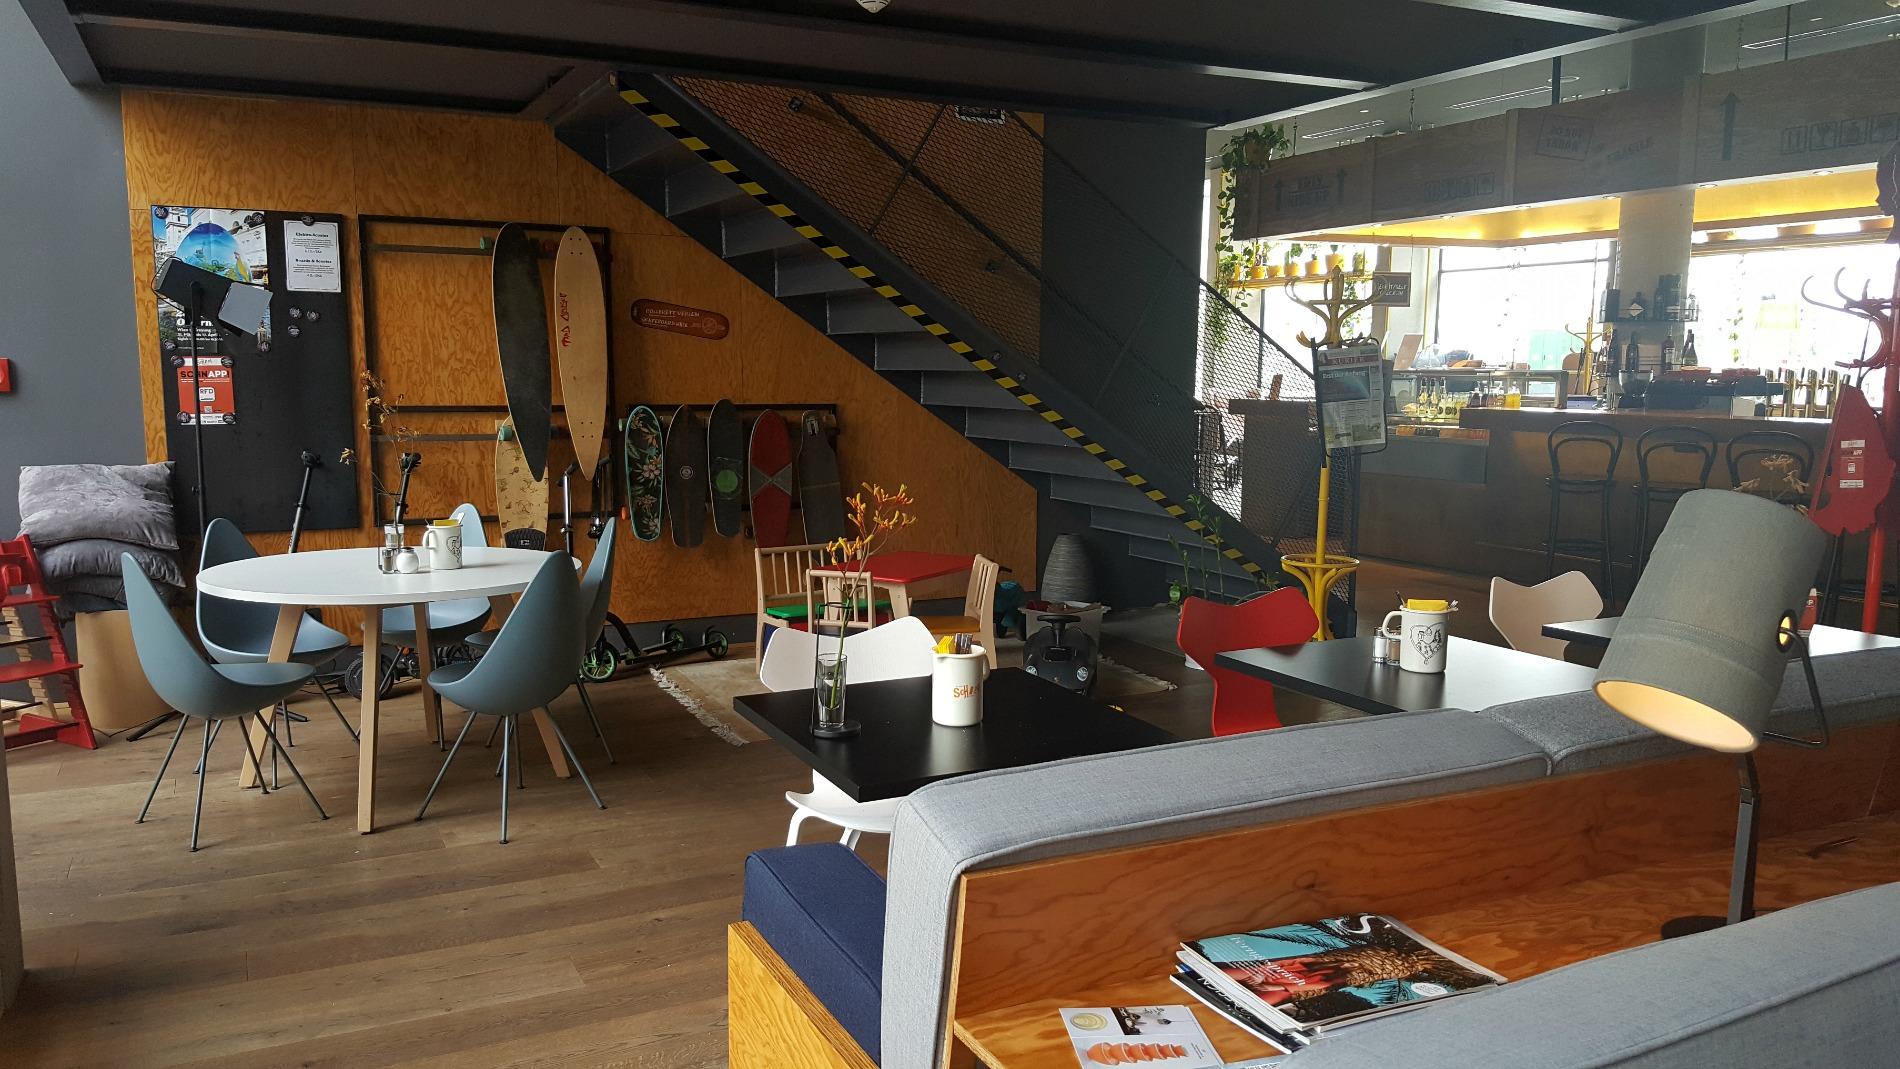 hotel schani wien lobby skateboard hire simply emma. Black Bedroom Furniture Sets. Home Design Ideas